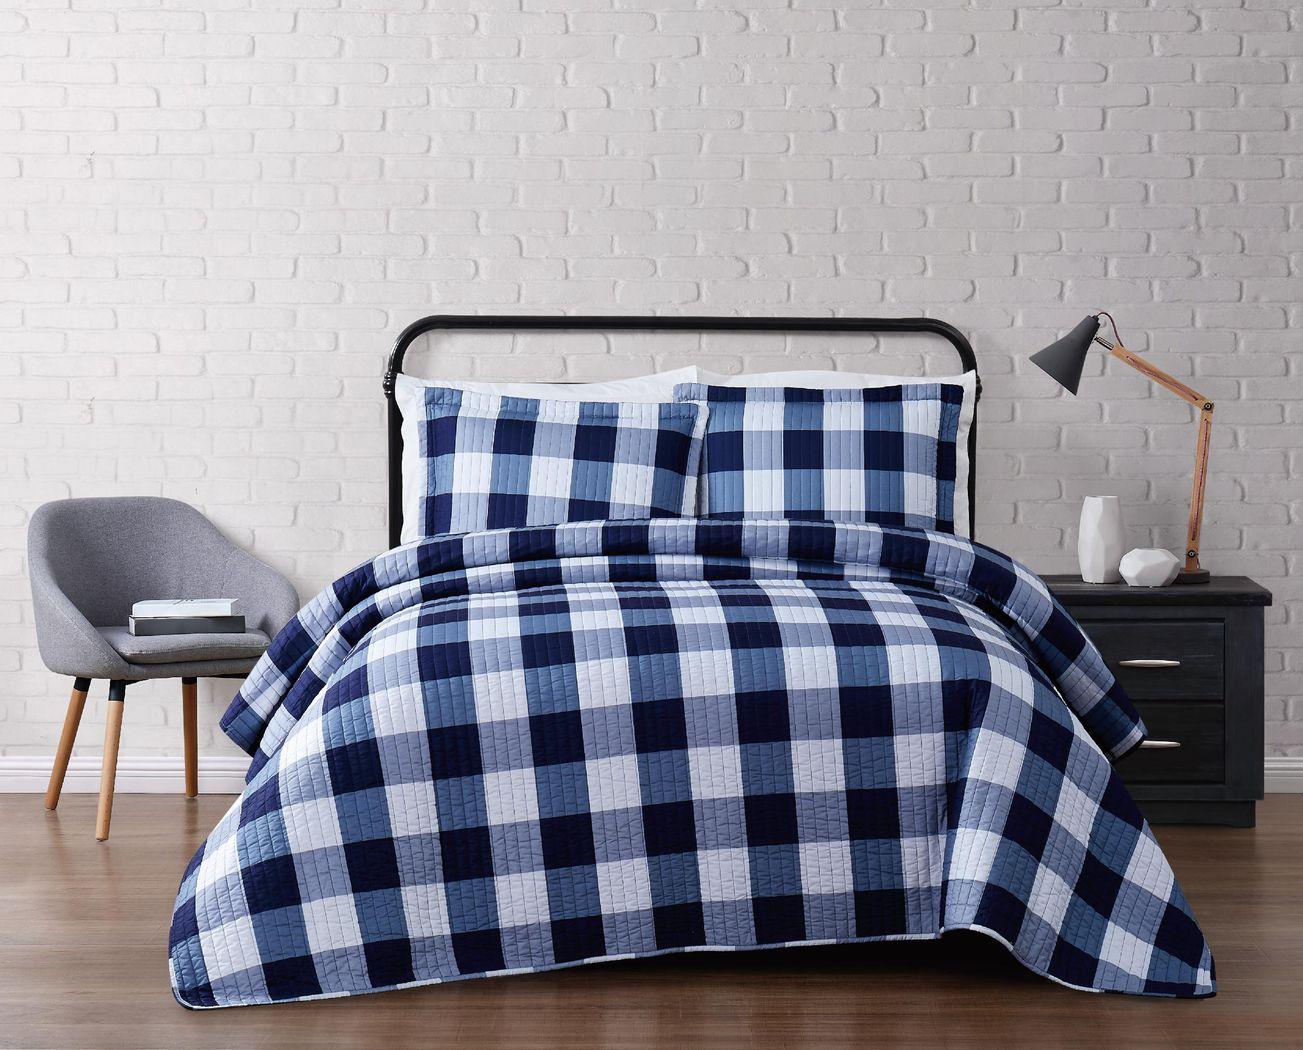 Kids Cottage Pearl Navy 3 Pc Full/Queen Comforter Set